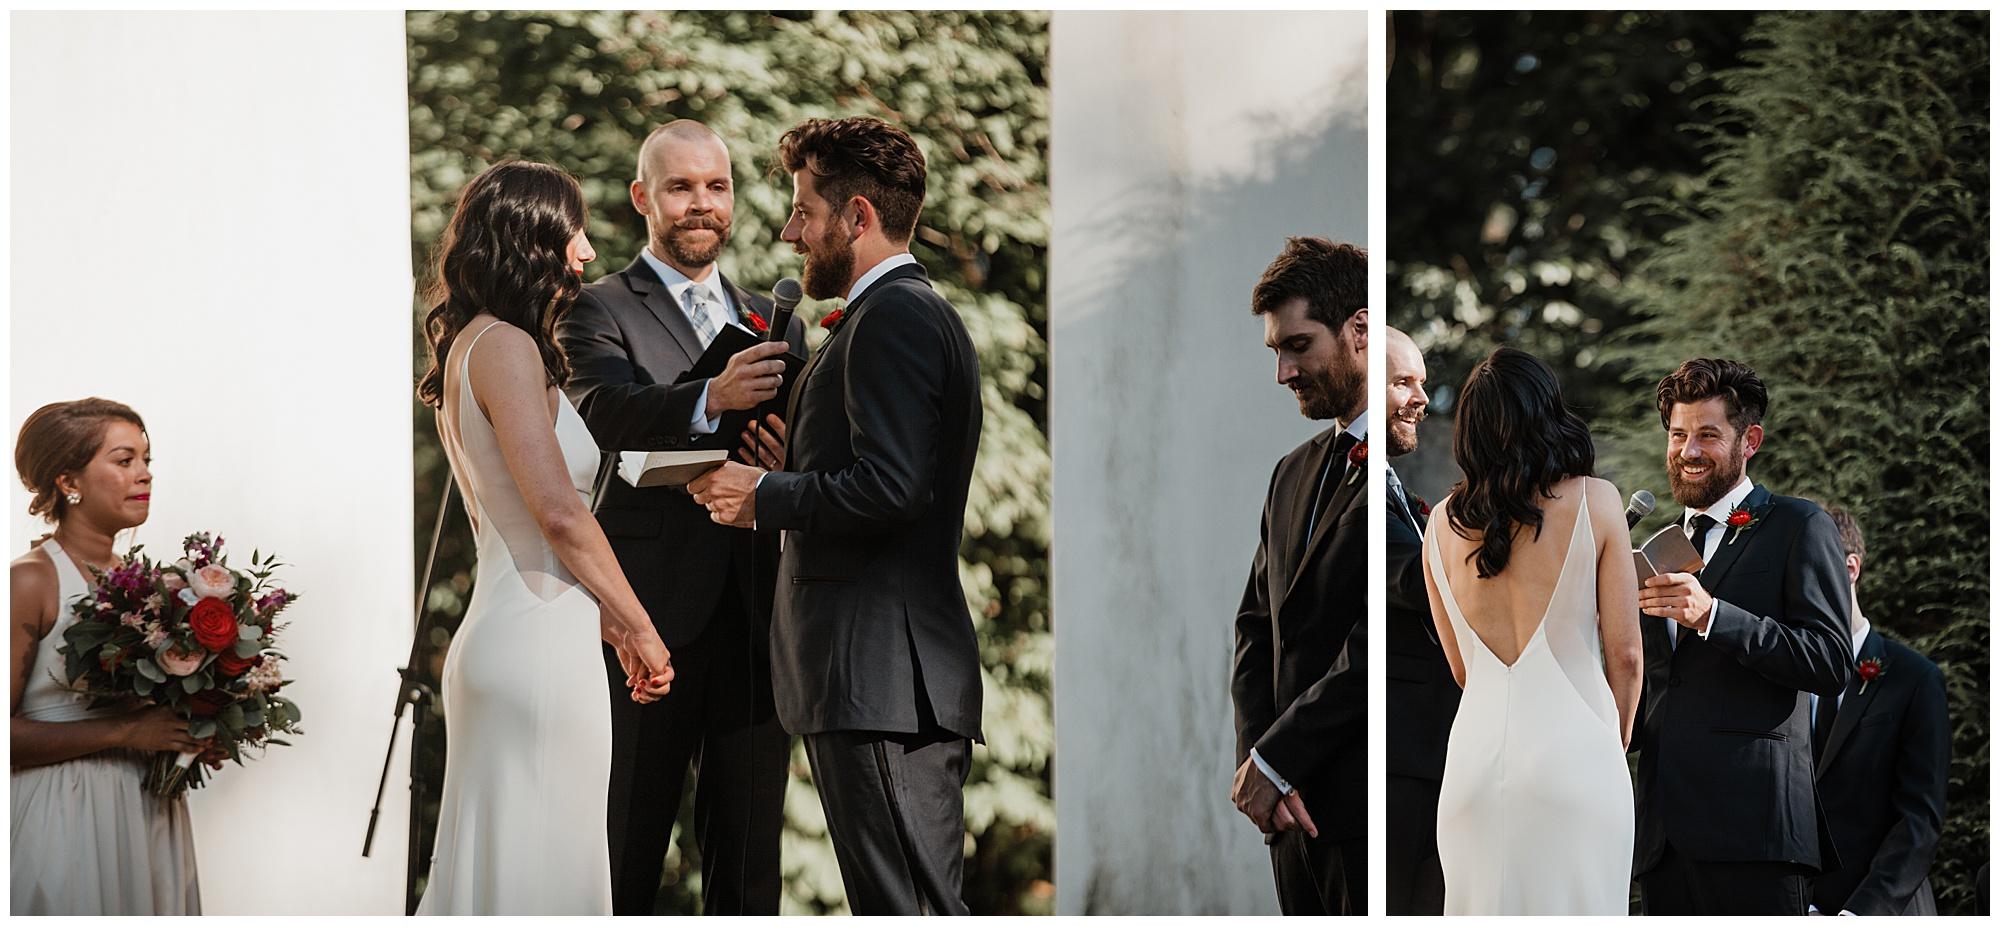 allerton_park_wedding_champaign_il_chicago_wright_photographs_ne_0032.jpg